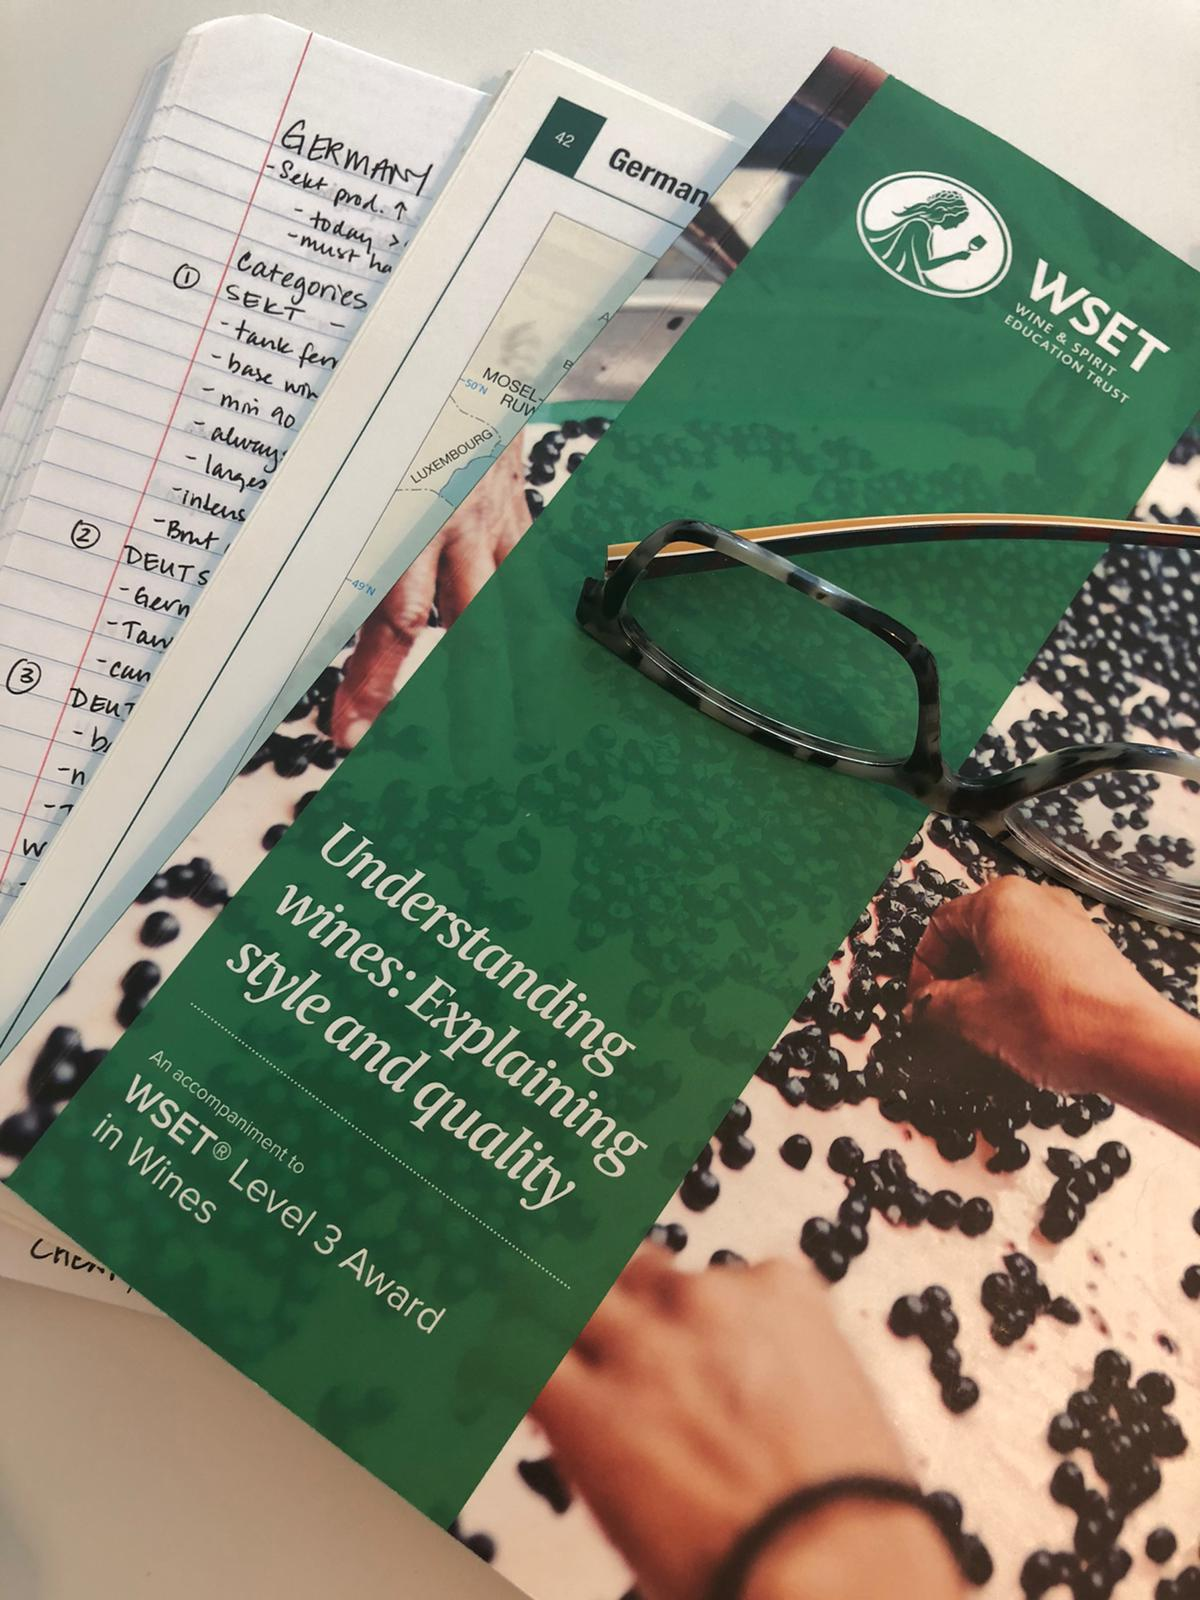 WSET Level 3 wine exam course book